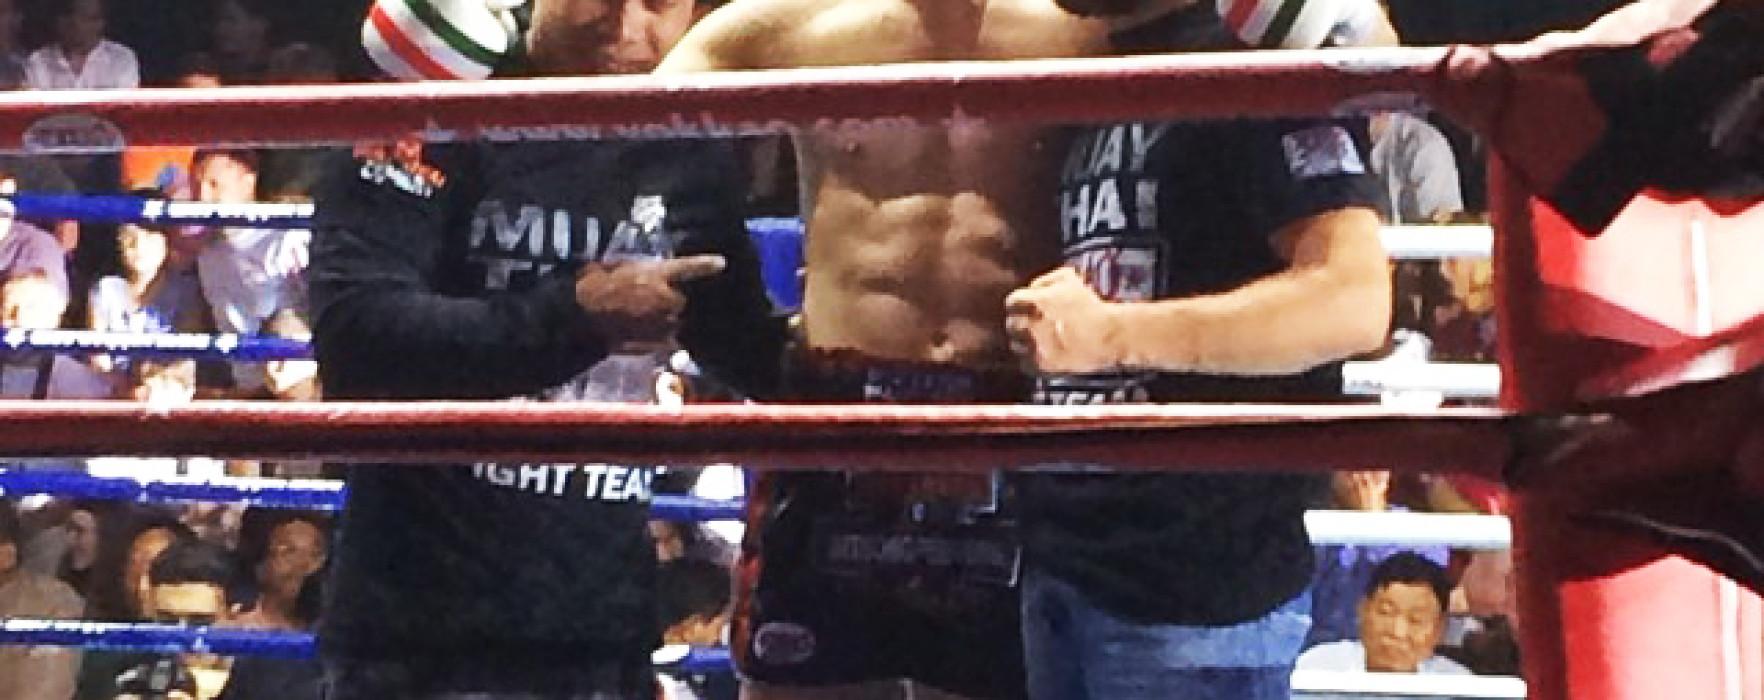 Resultats Muay Thai Combat Mania Yokkao6